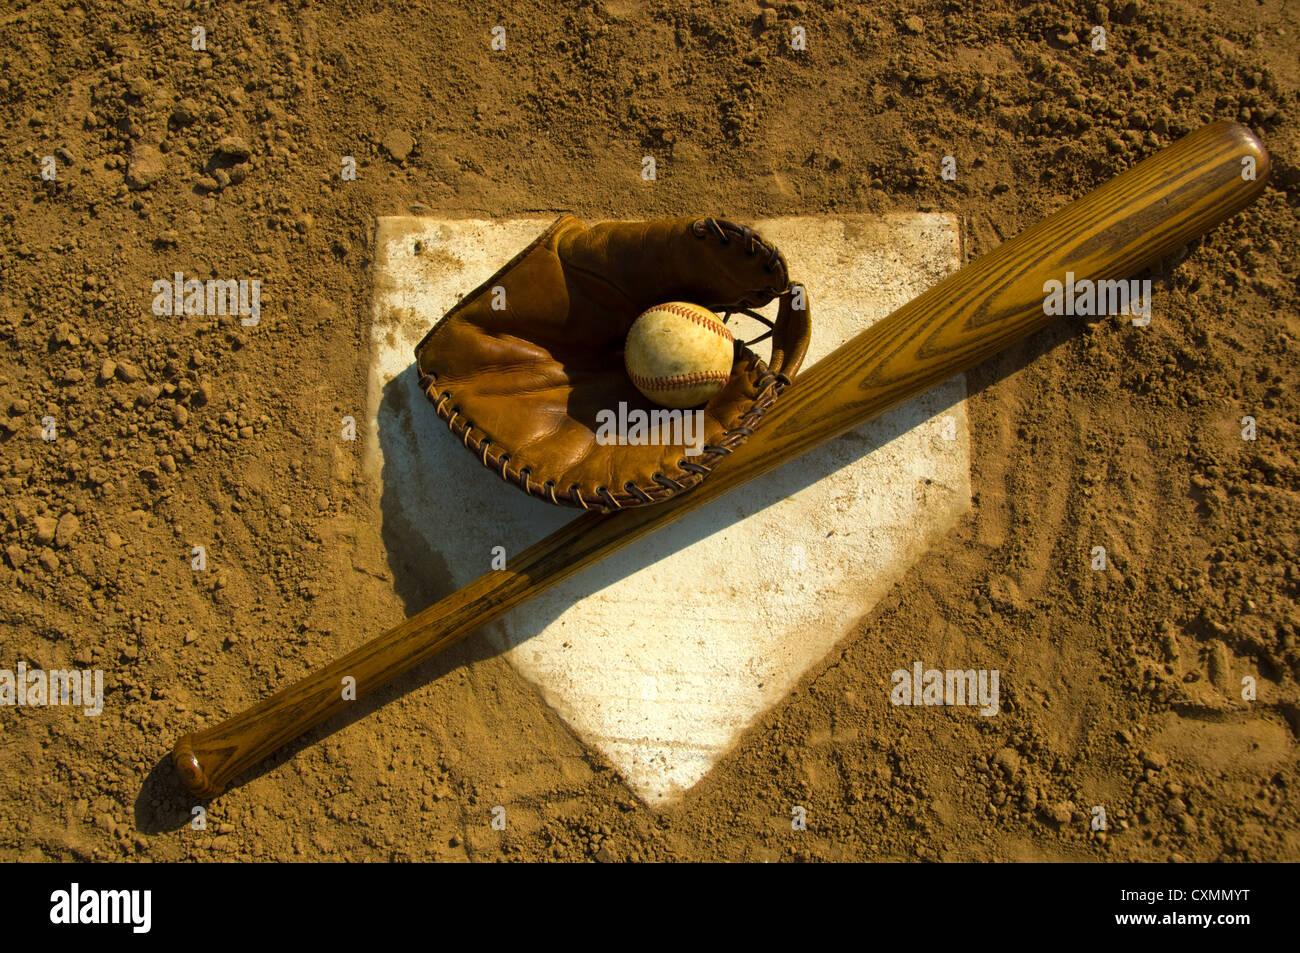 vintage wooden baseball bat glove and baseball on home plate